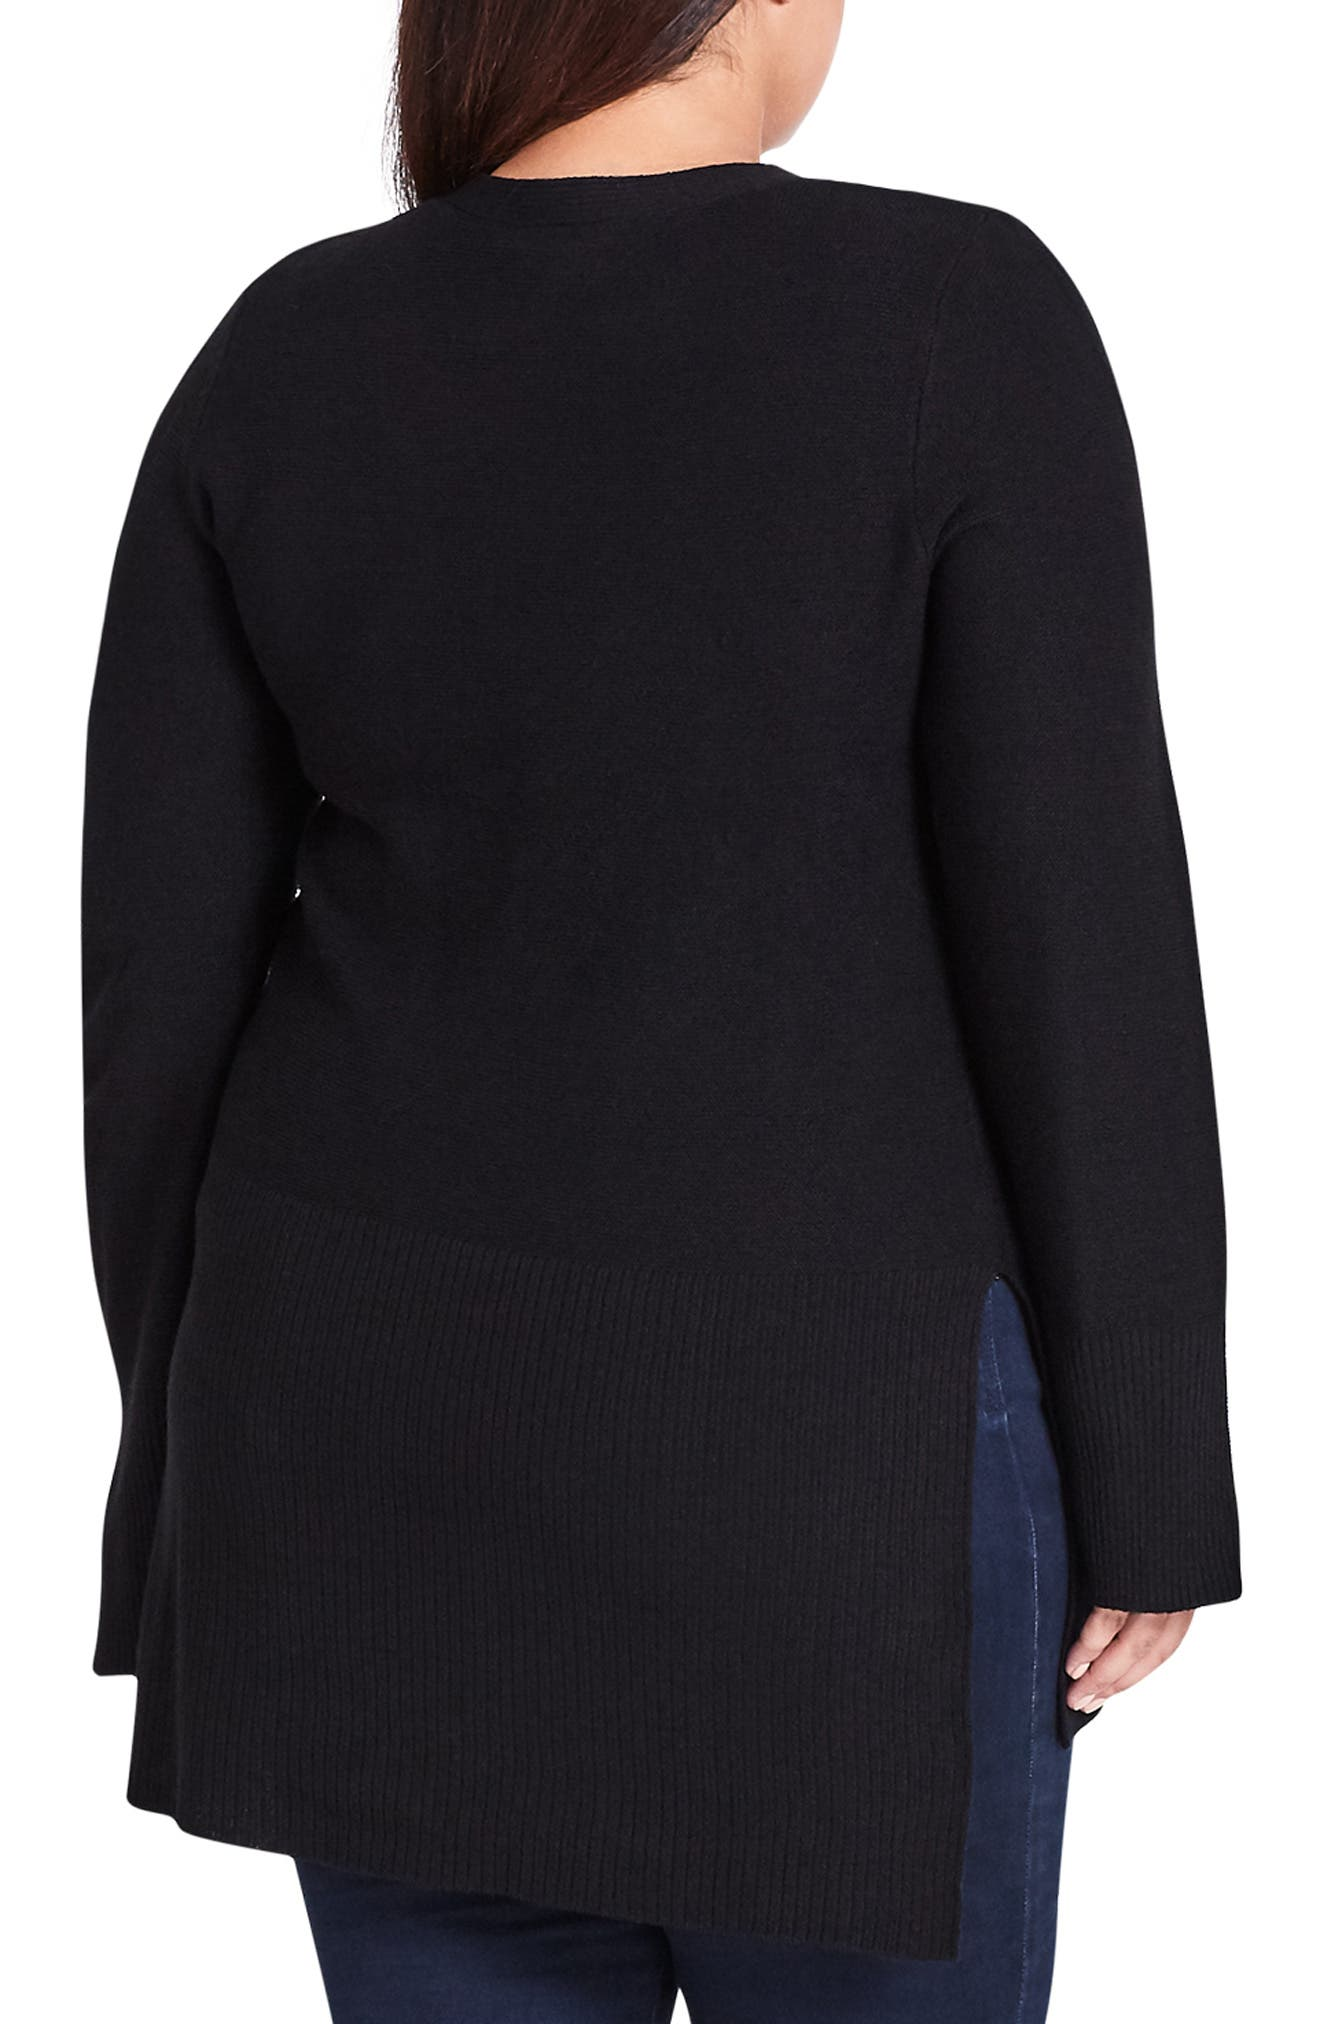 Crisscross Neck Sweater,                             Alternate thumbnail 2, color,                             BLACK